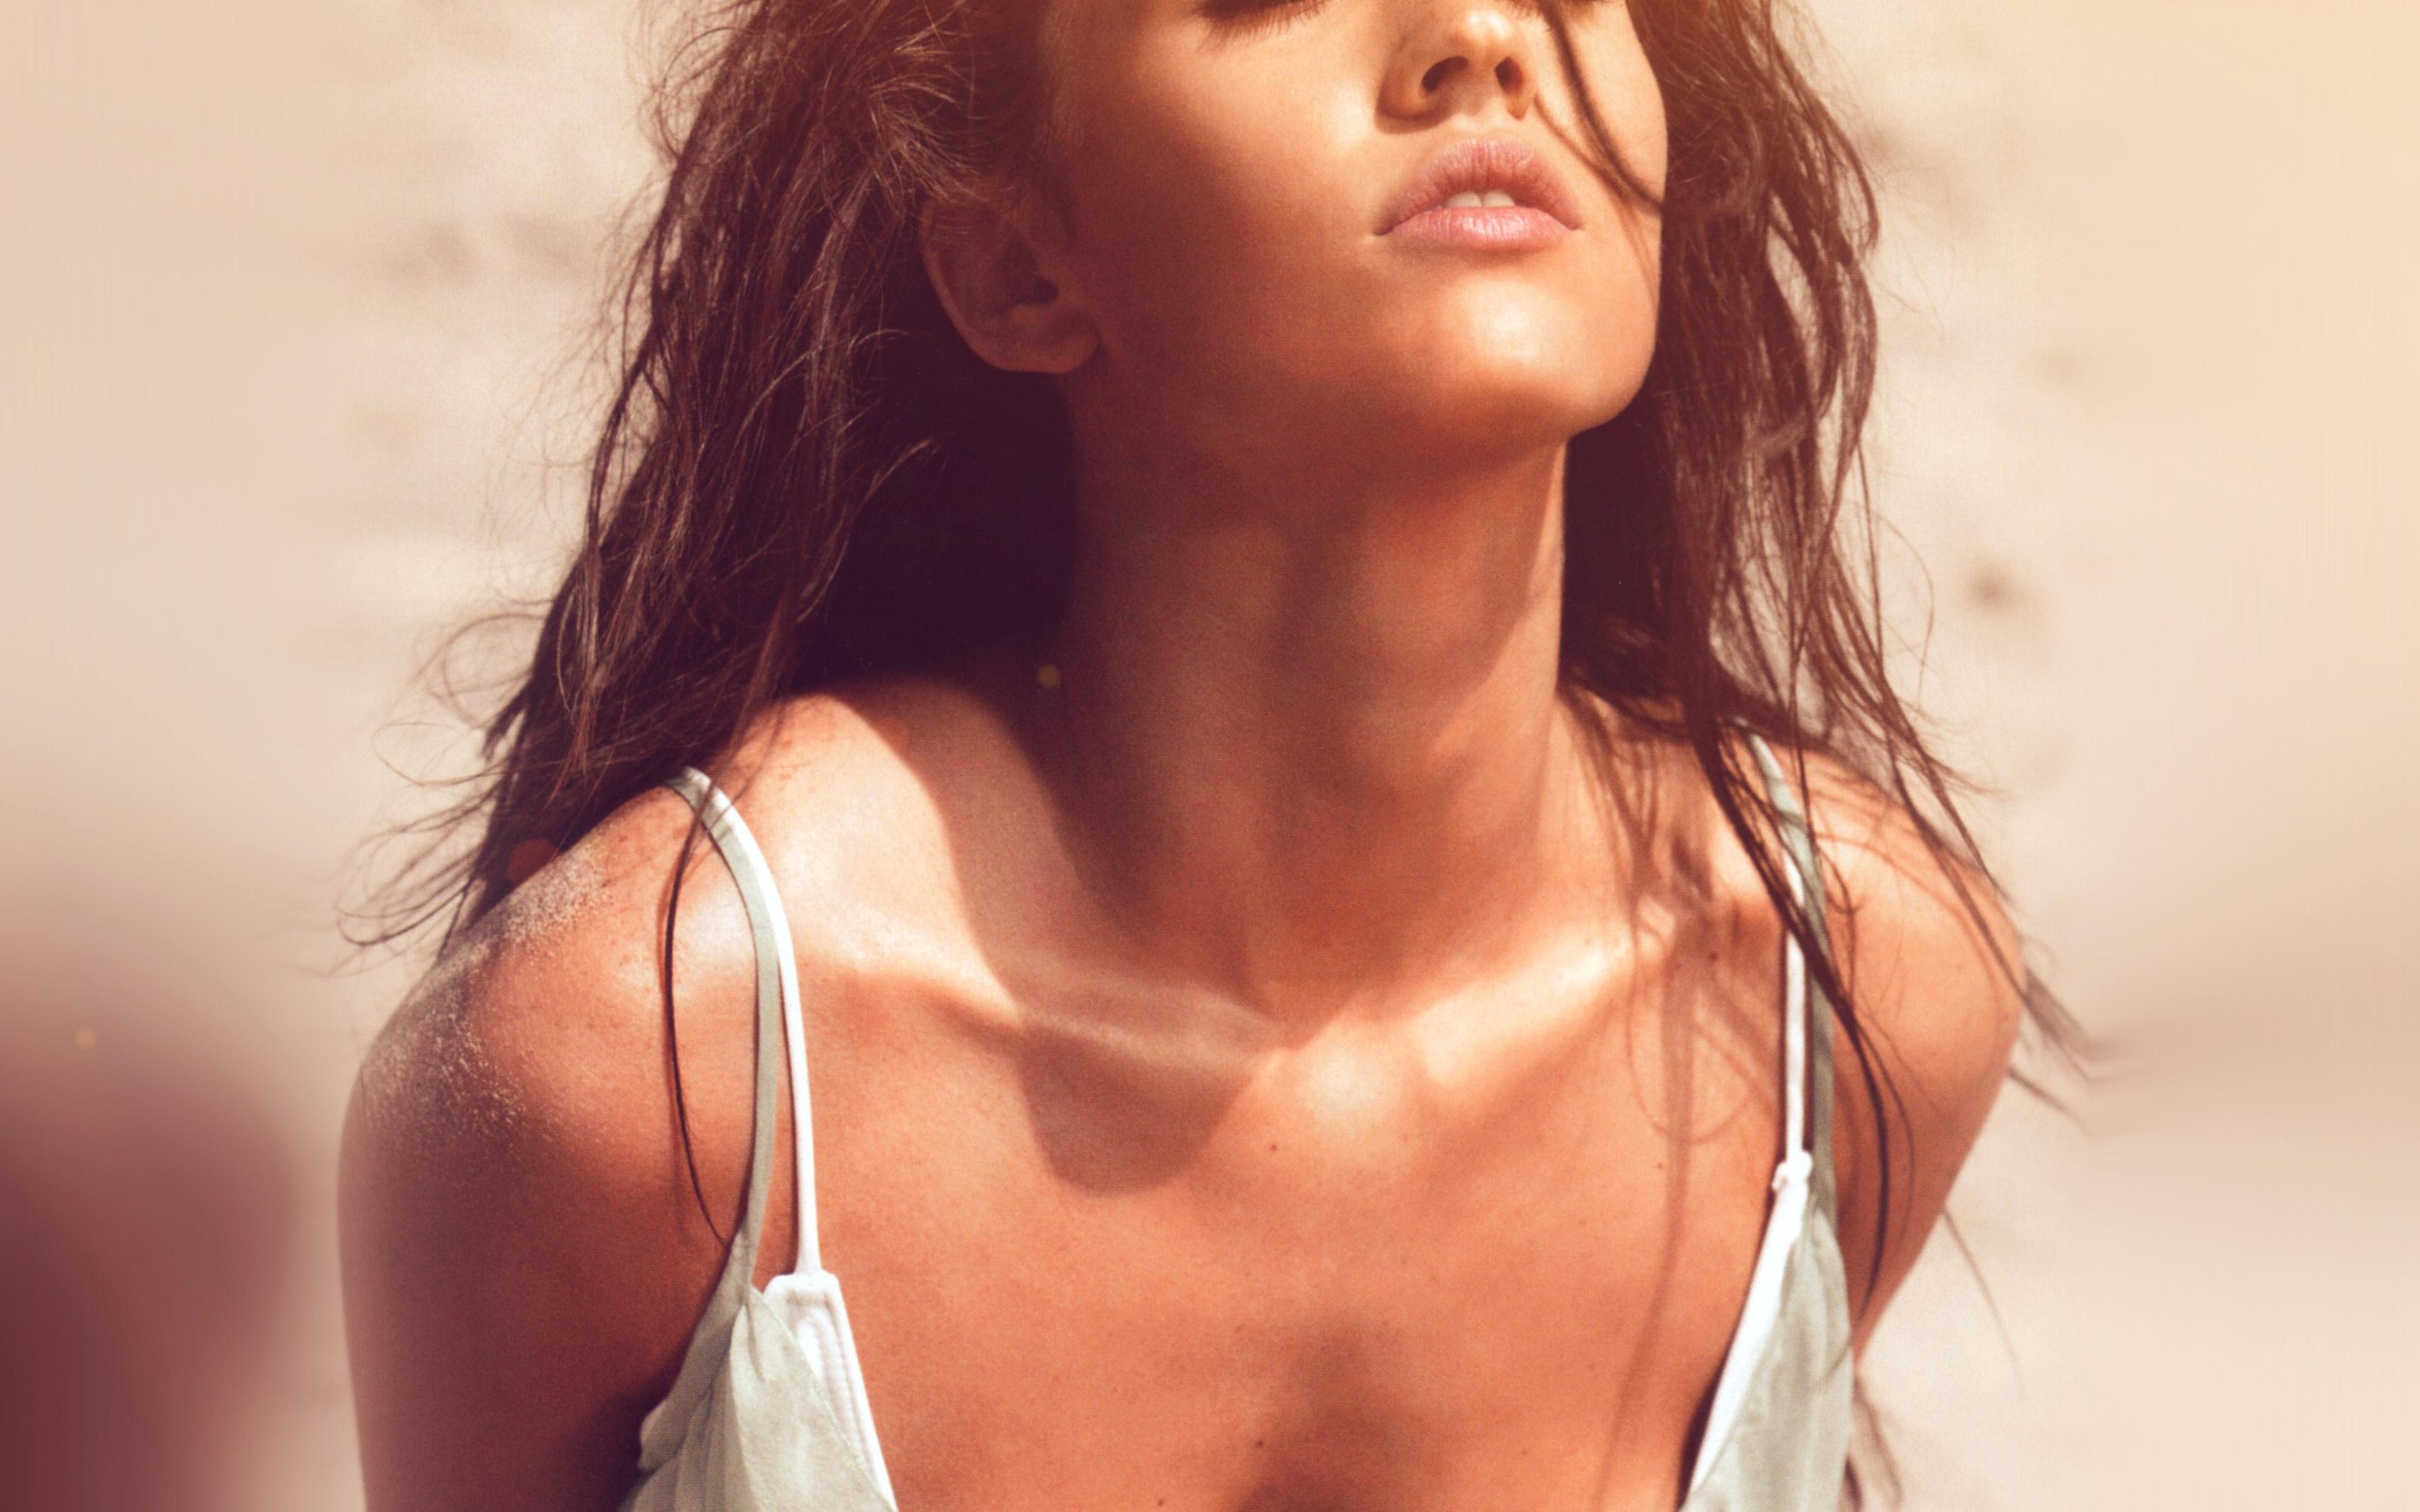 hj71-megan-fox-sexy-swim-summer-girl-flare-wallpaper